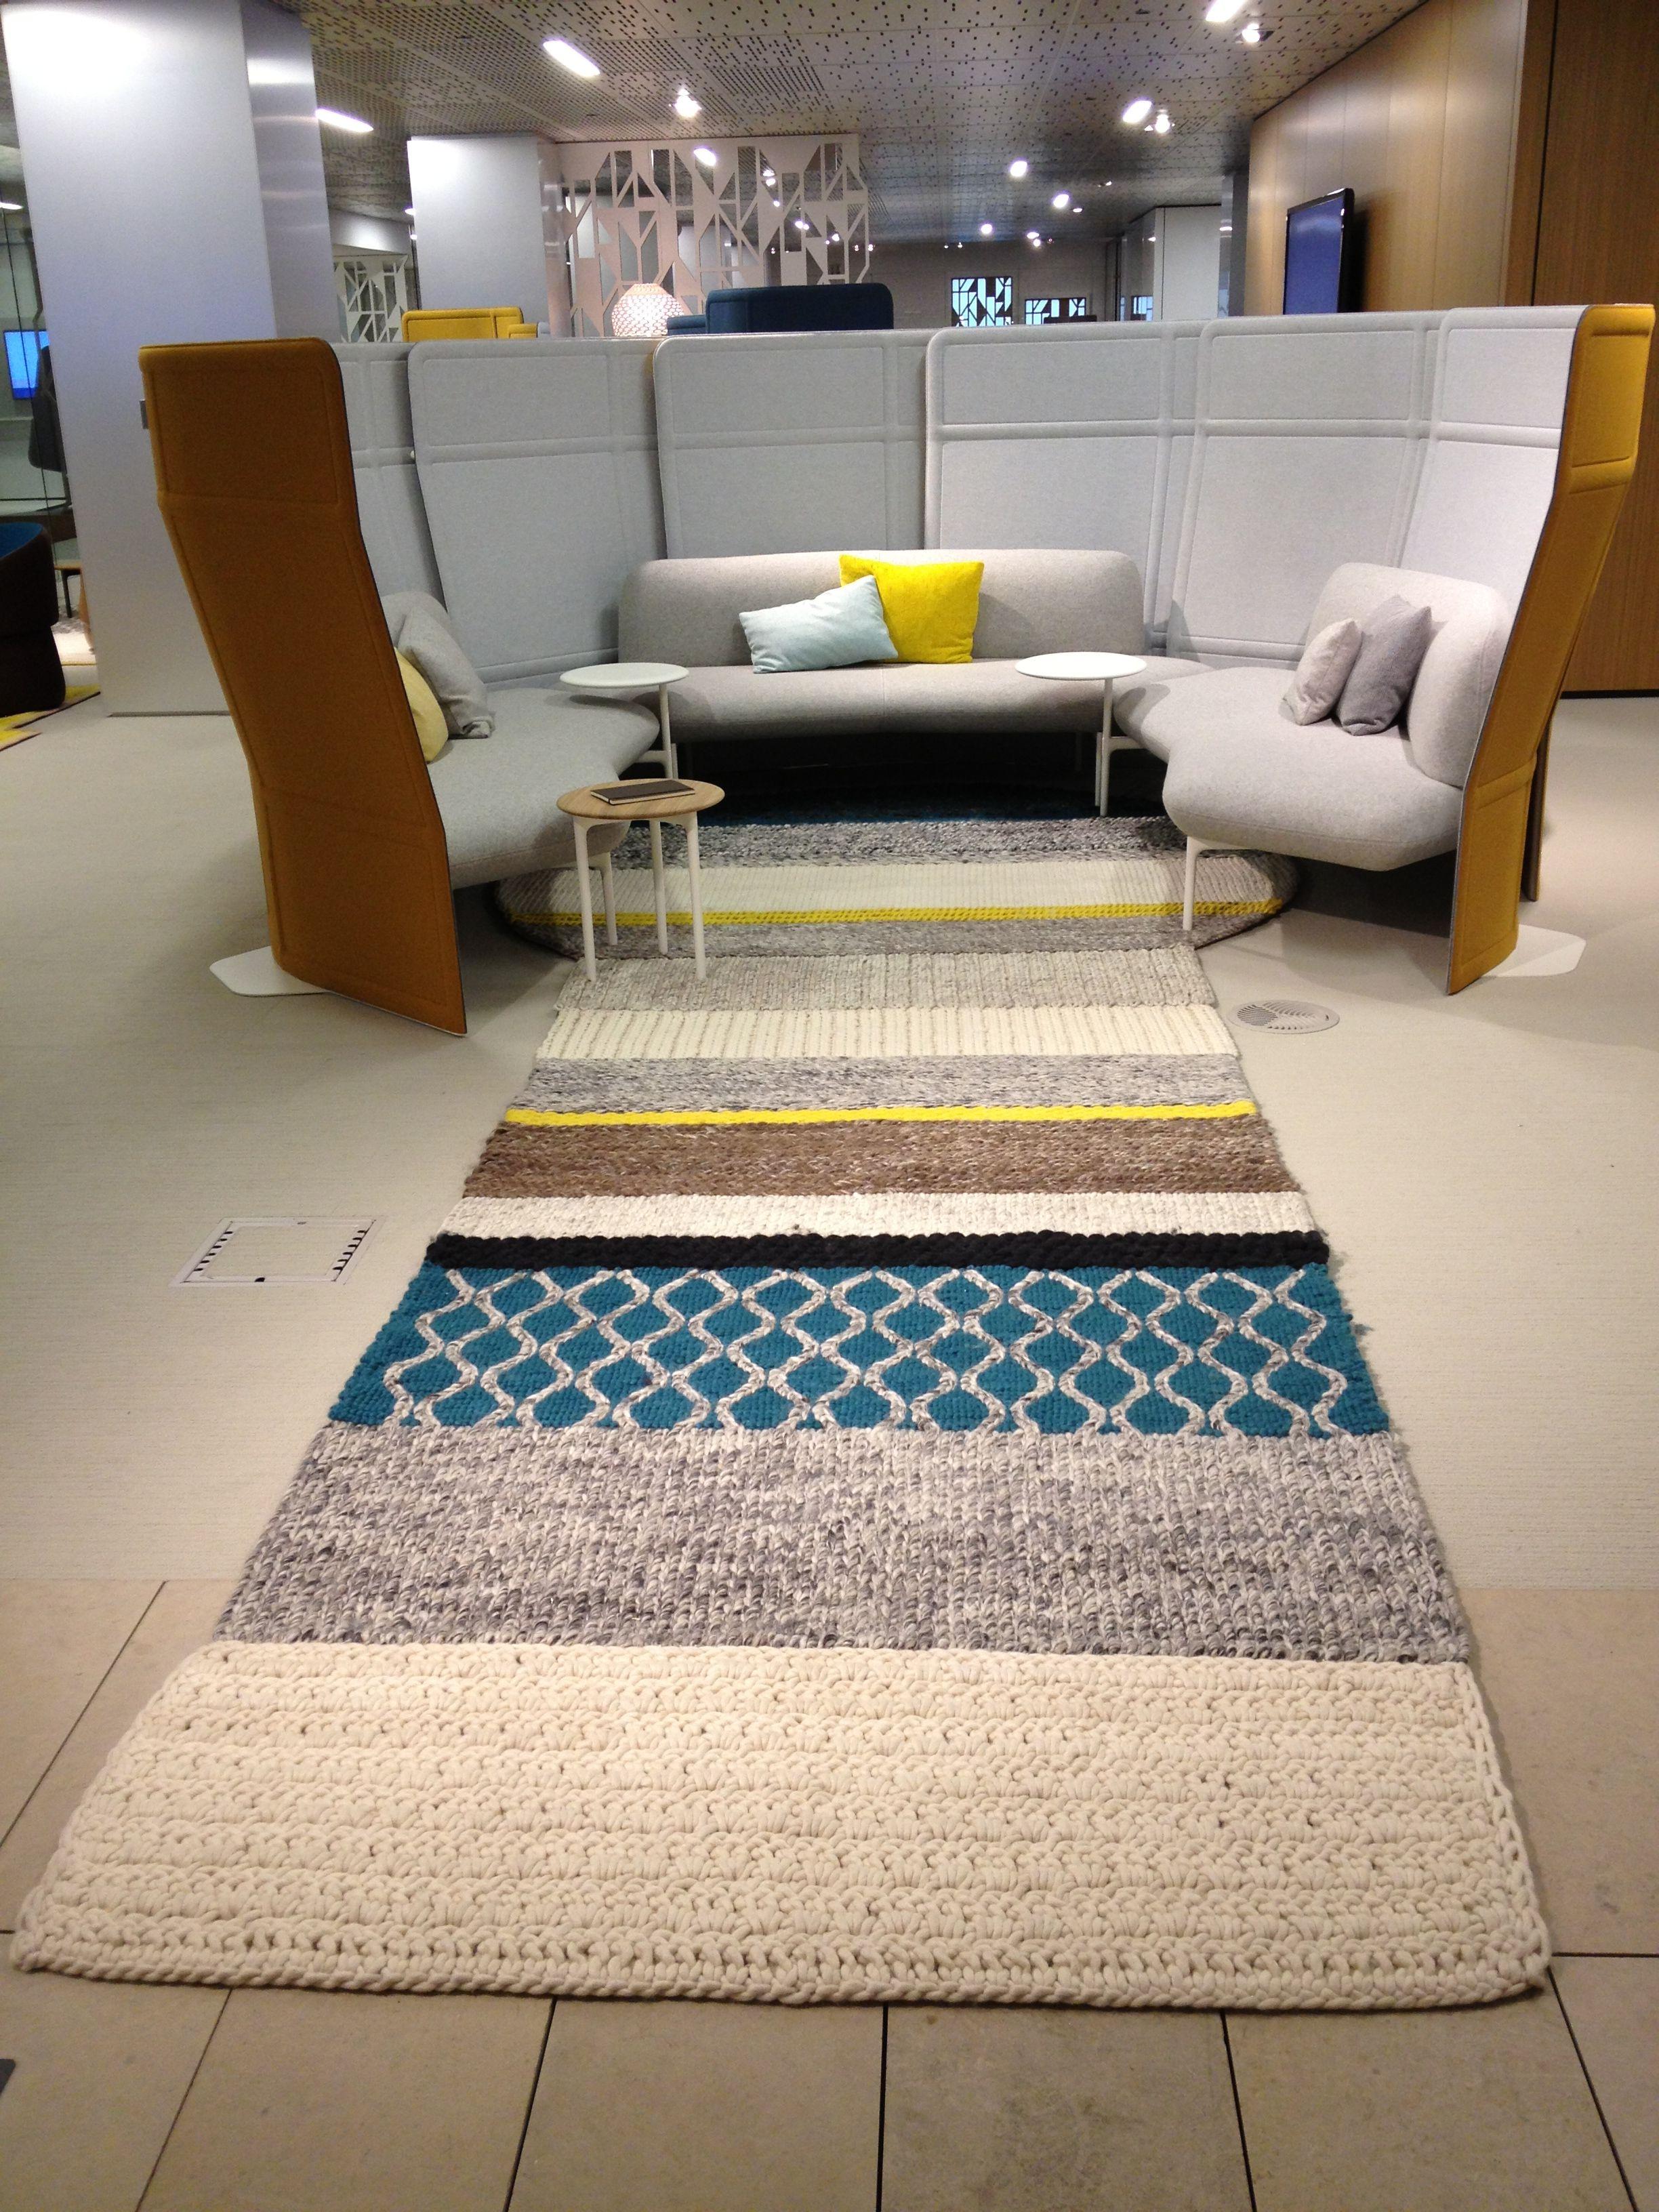 Haworth Showroom Collaborative Lounge by Studio Urquiola Gandia Blasco wool rug